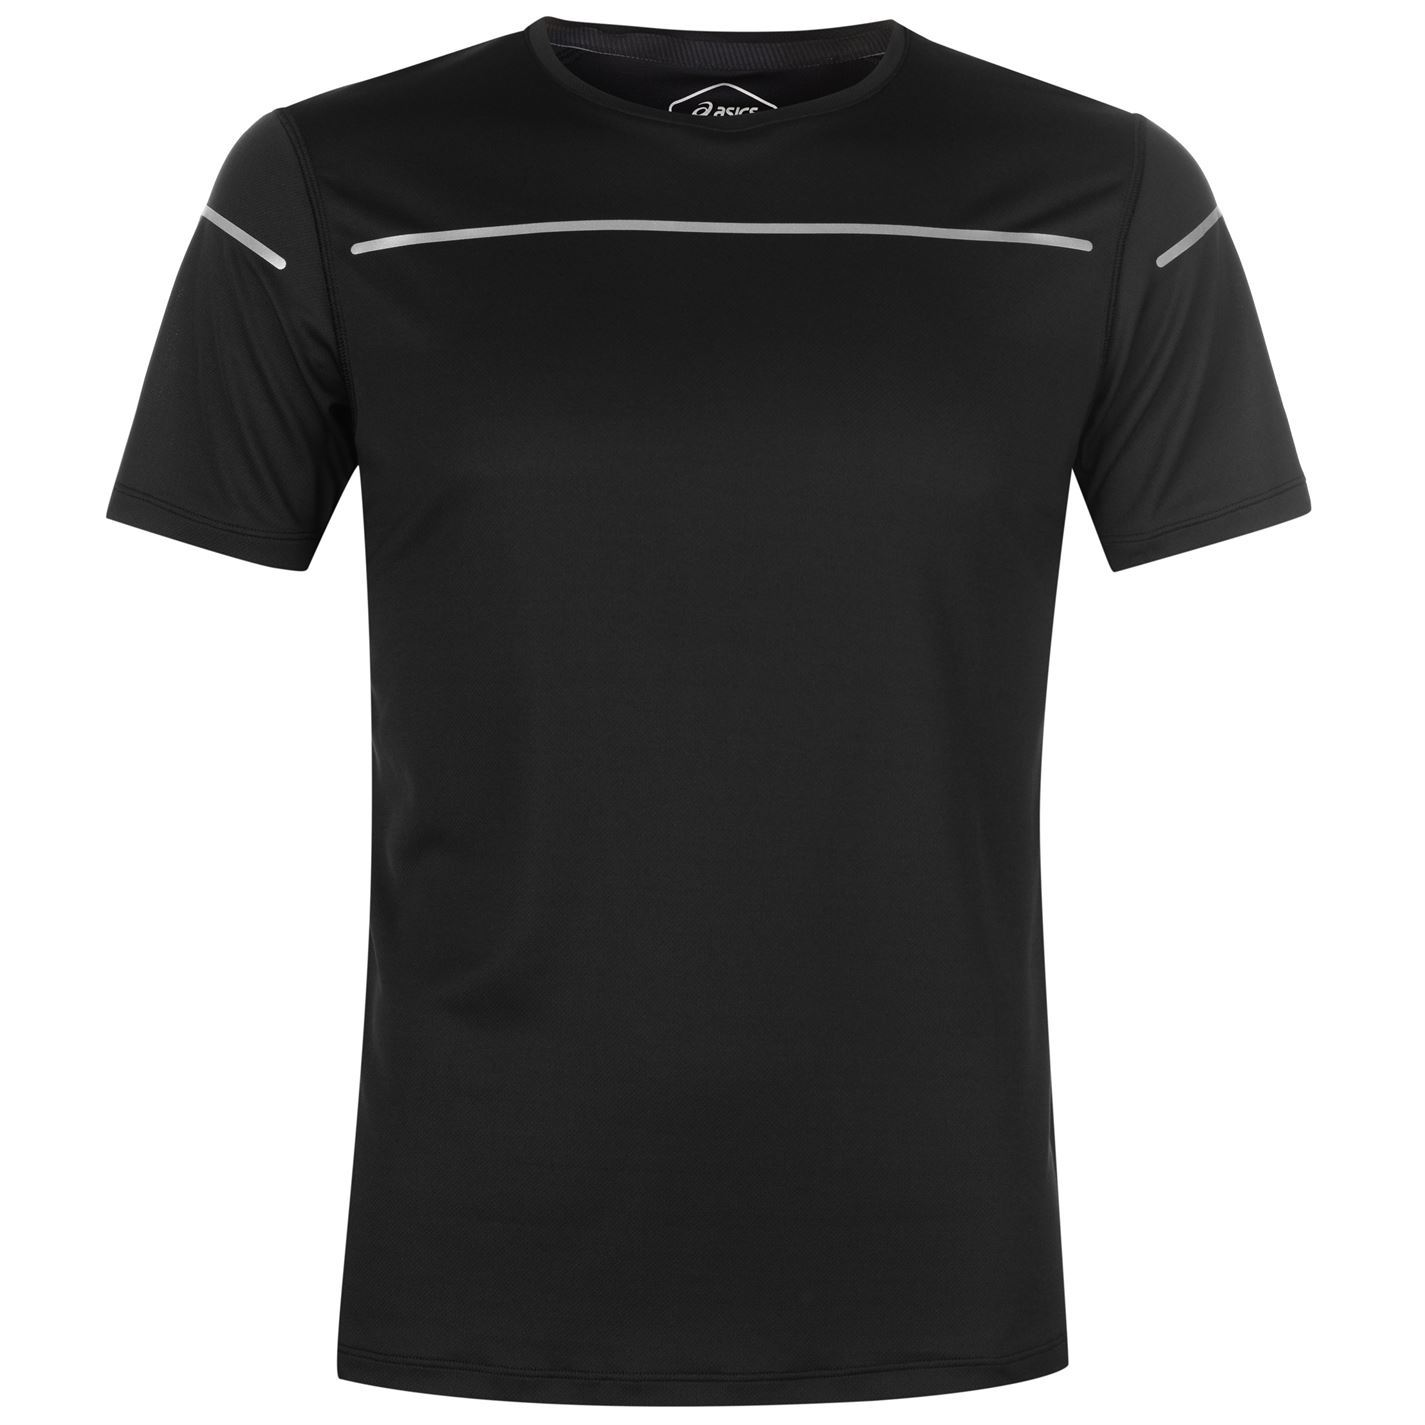 Performance T Shirt Mens Tee Sleeve Short Top Gents Lite Crew Asics 0qwHOFa